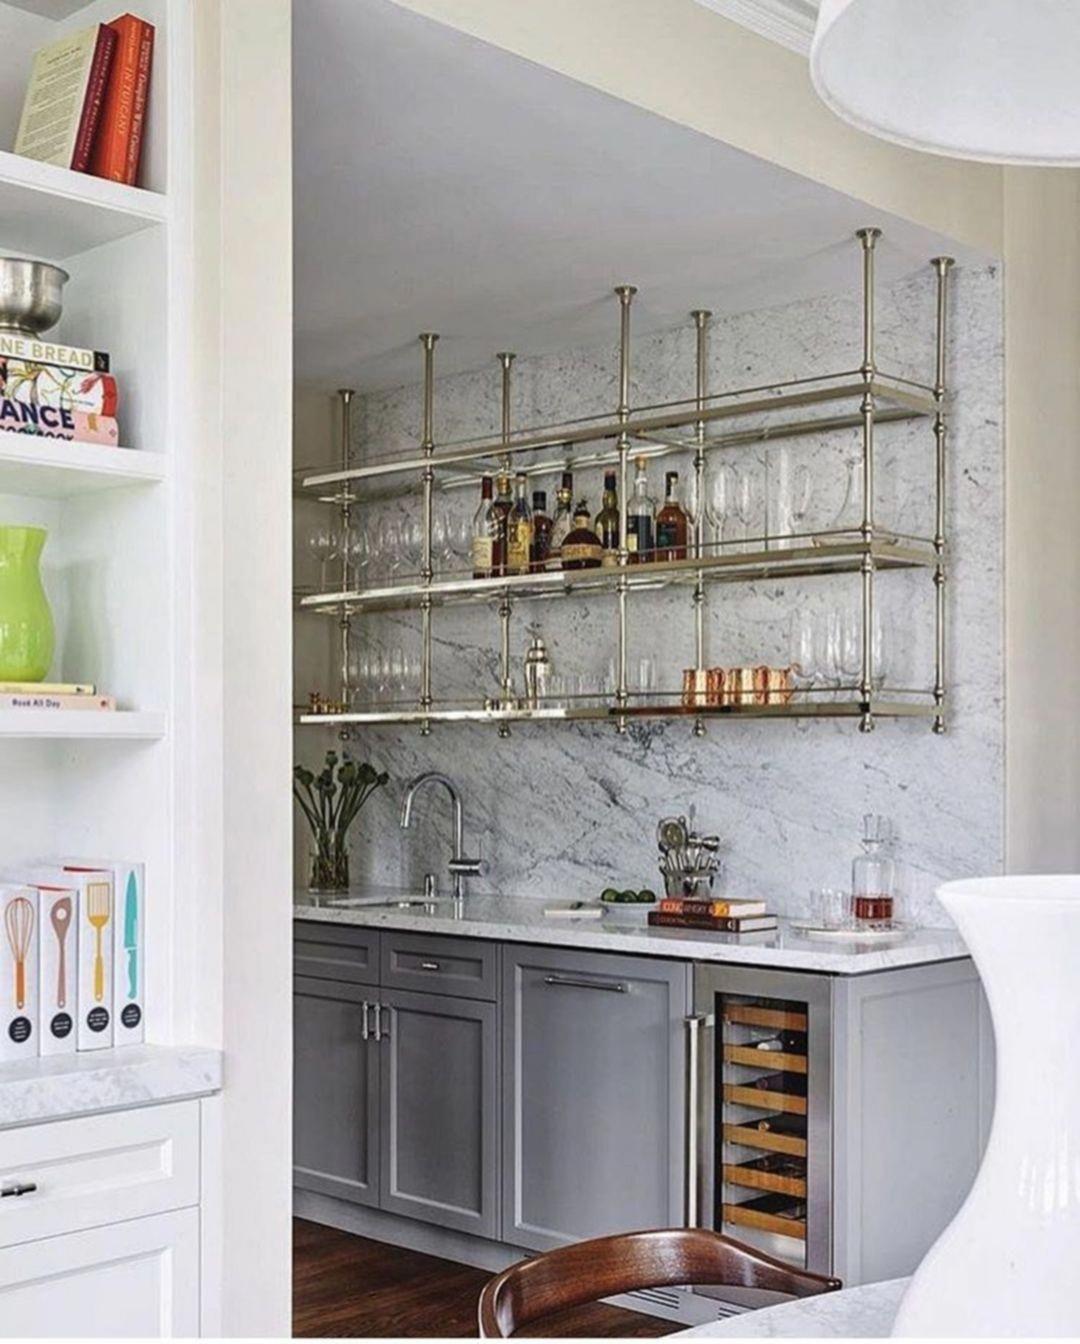 Kitchen Themes Best Kitchen Decor Fun Kitchen Decorating Themes